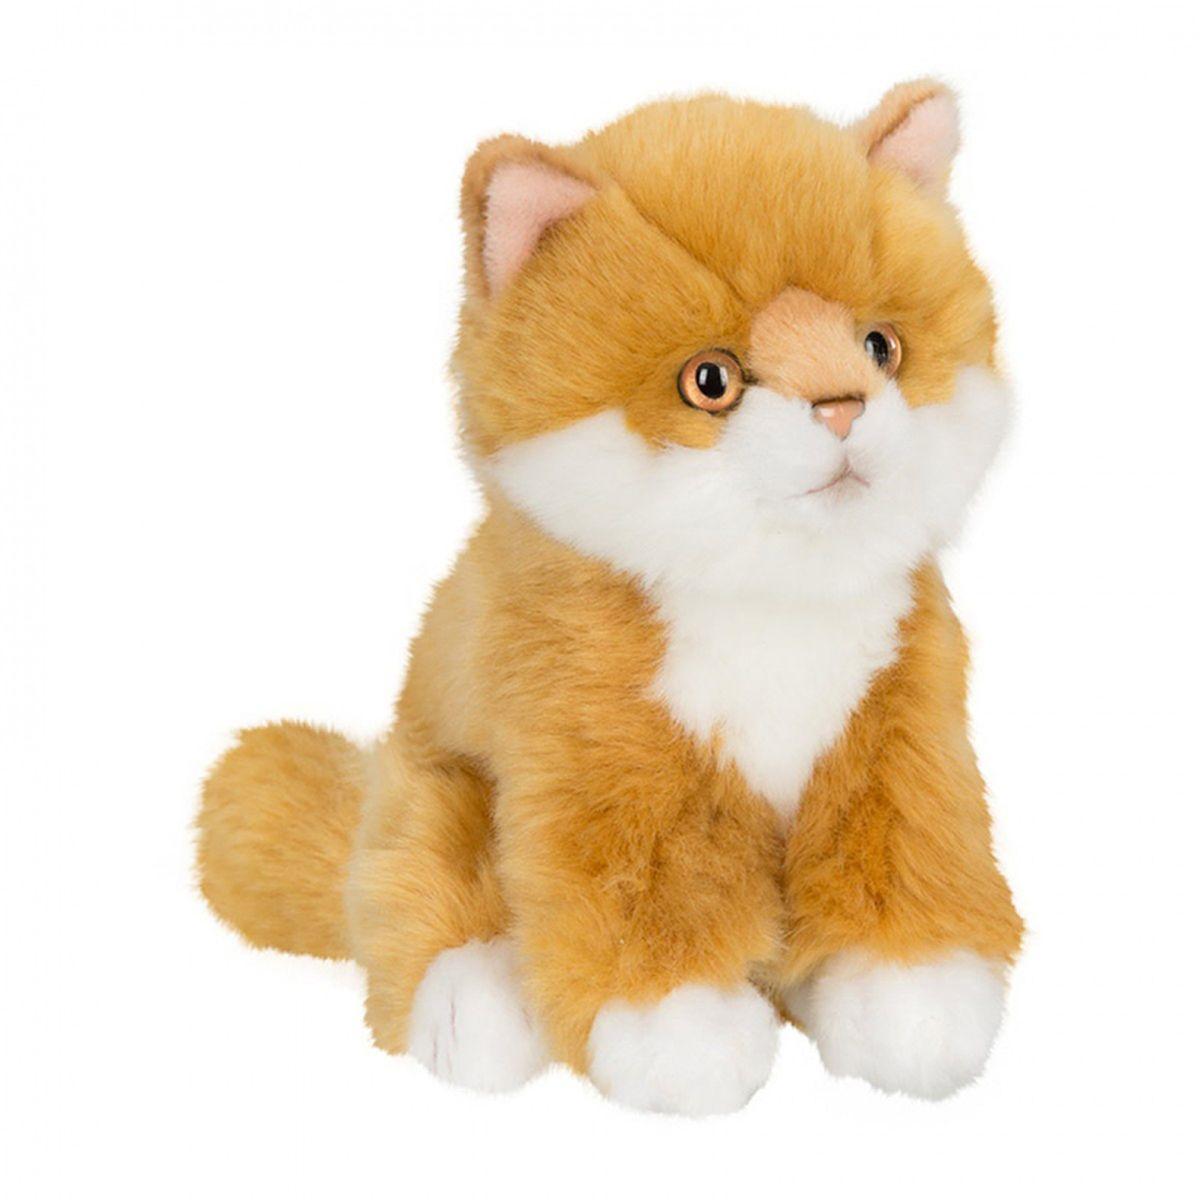 Anna Club Plush Котёнок сибирский рыжий, сидит 15 см anna club plush мягкая игрушка бассет хаунд 18 см